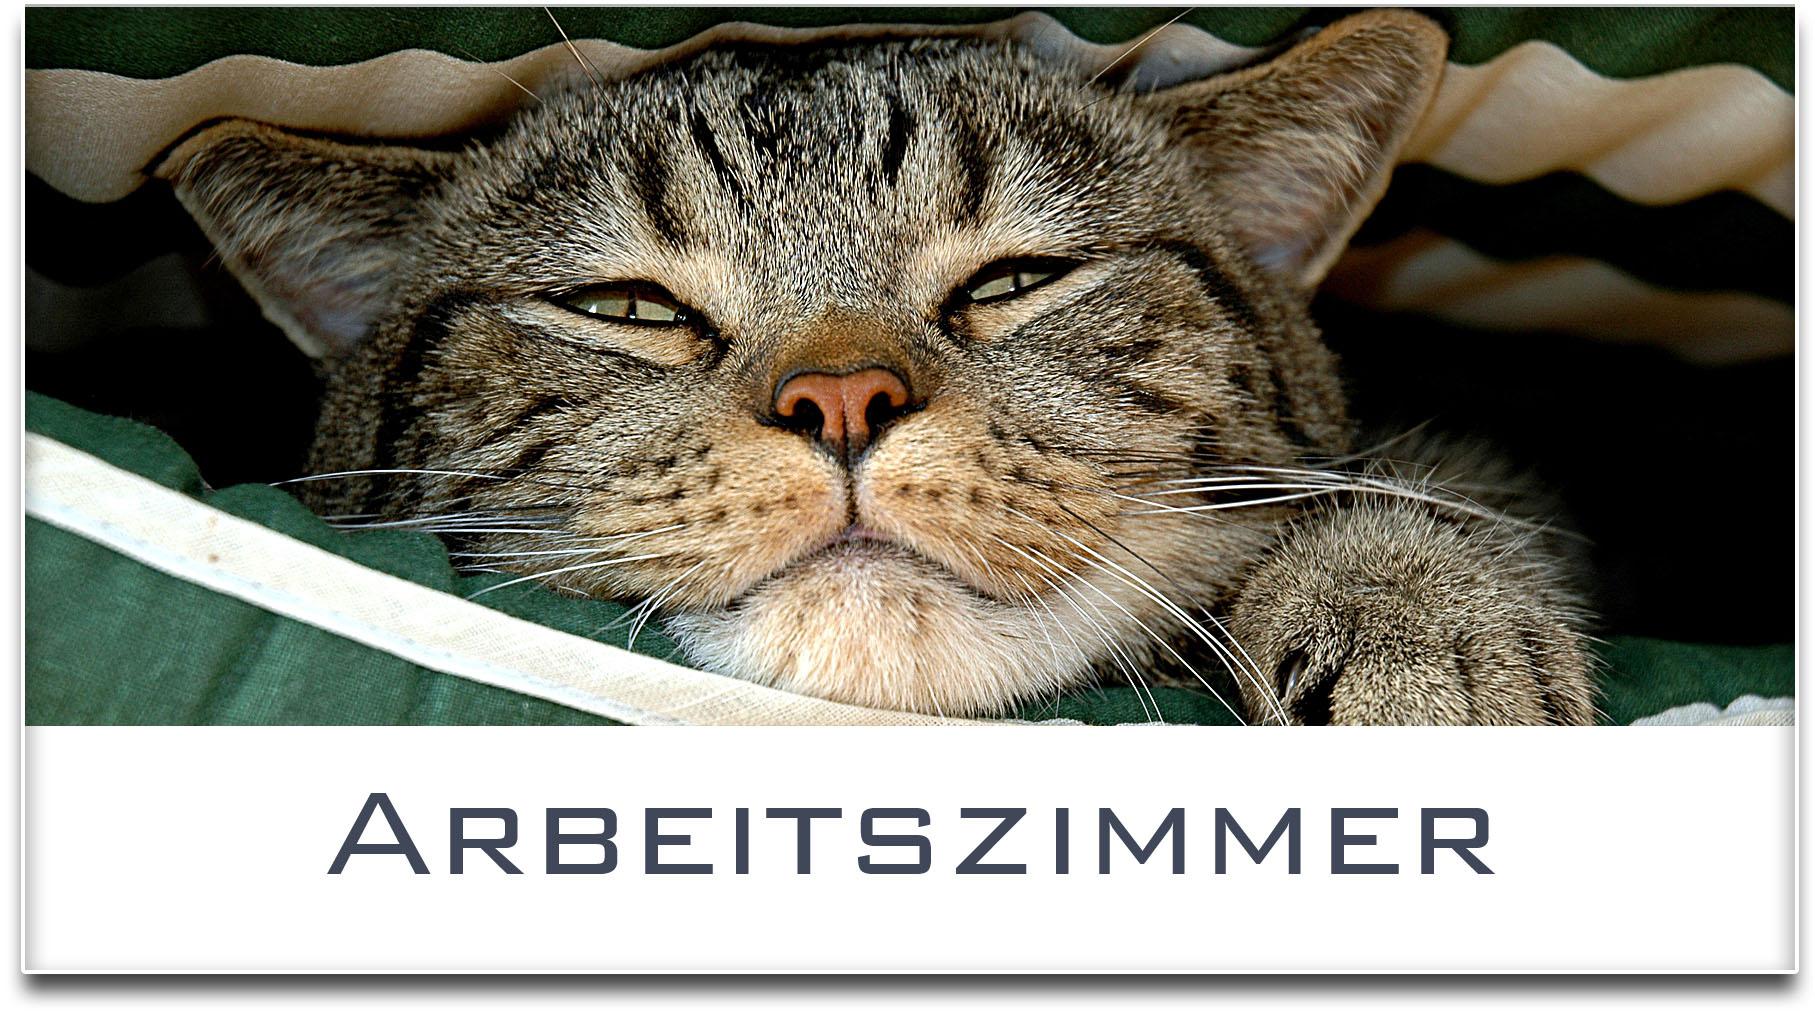 Türschild / Haustürschild / Katze / Arbeitszimmer / Selbstklebend